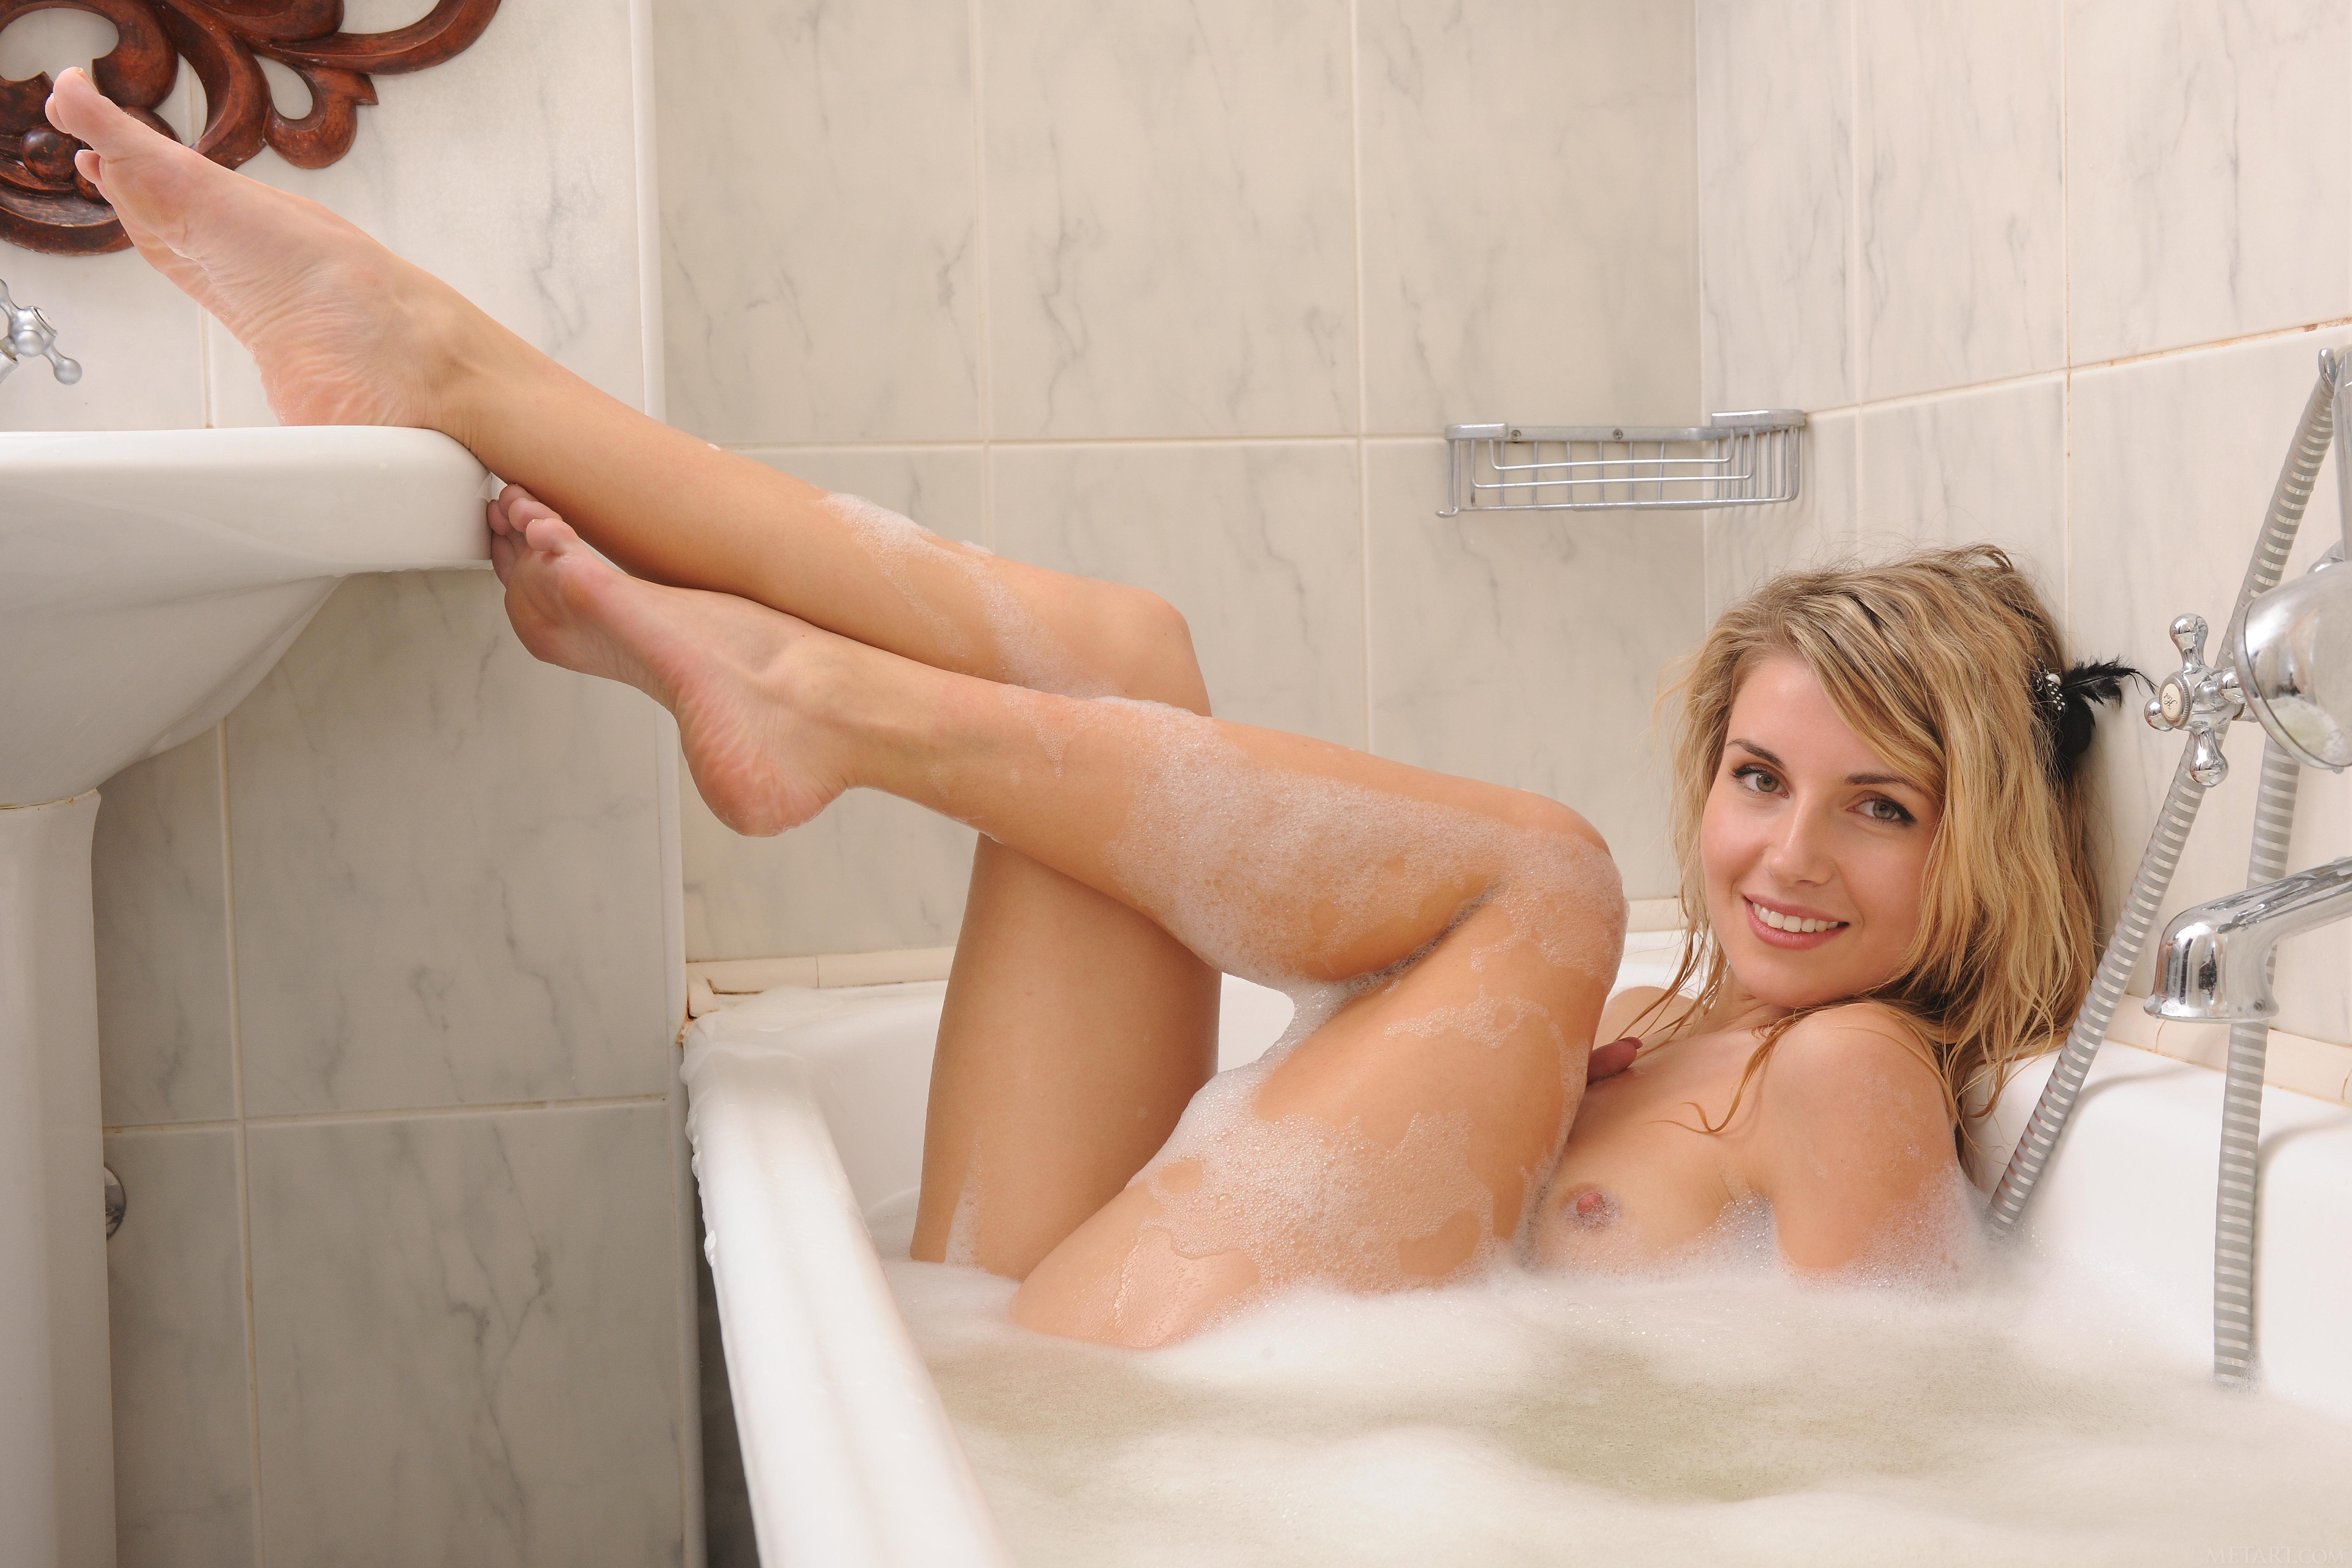 Wallpaper Lisi A, Sexy Girl, Ukrainian, Bath, Foam, Beautiful Female Legs, Lizzie T, Hi-Q, Sexy, Bathtub, Wet, Bathroom, Smile, Sexy Legs, Tits -2587